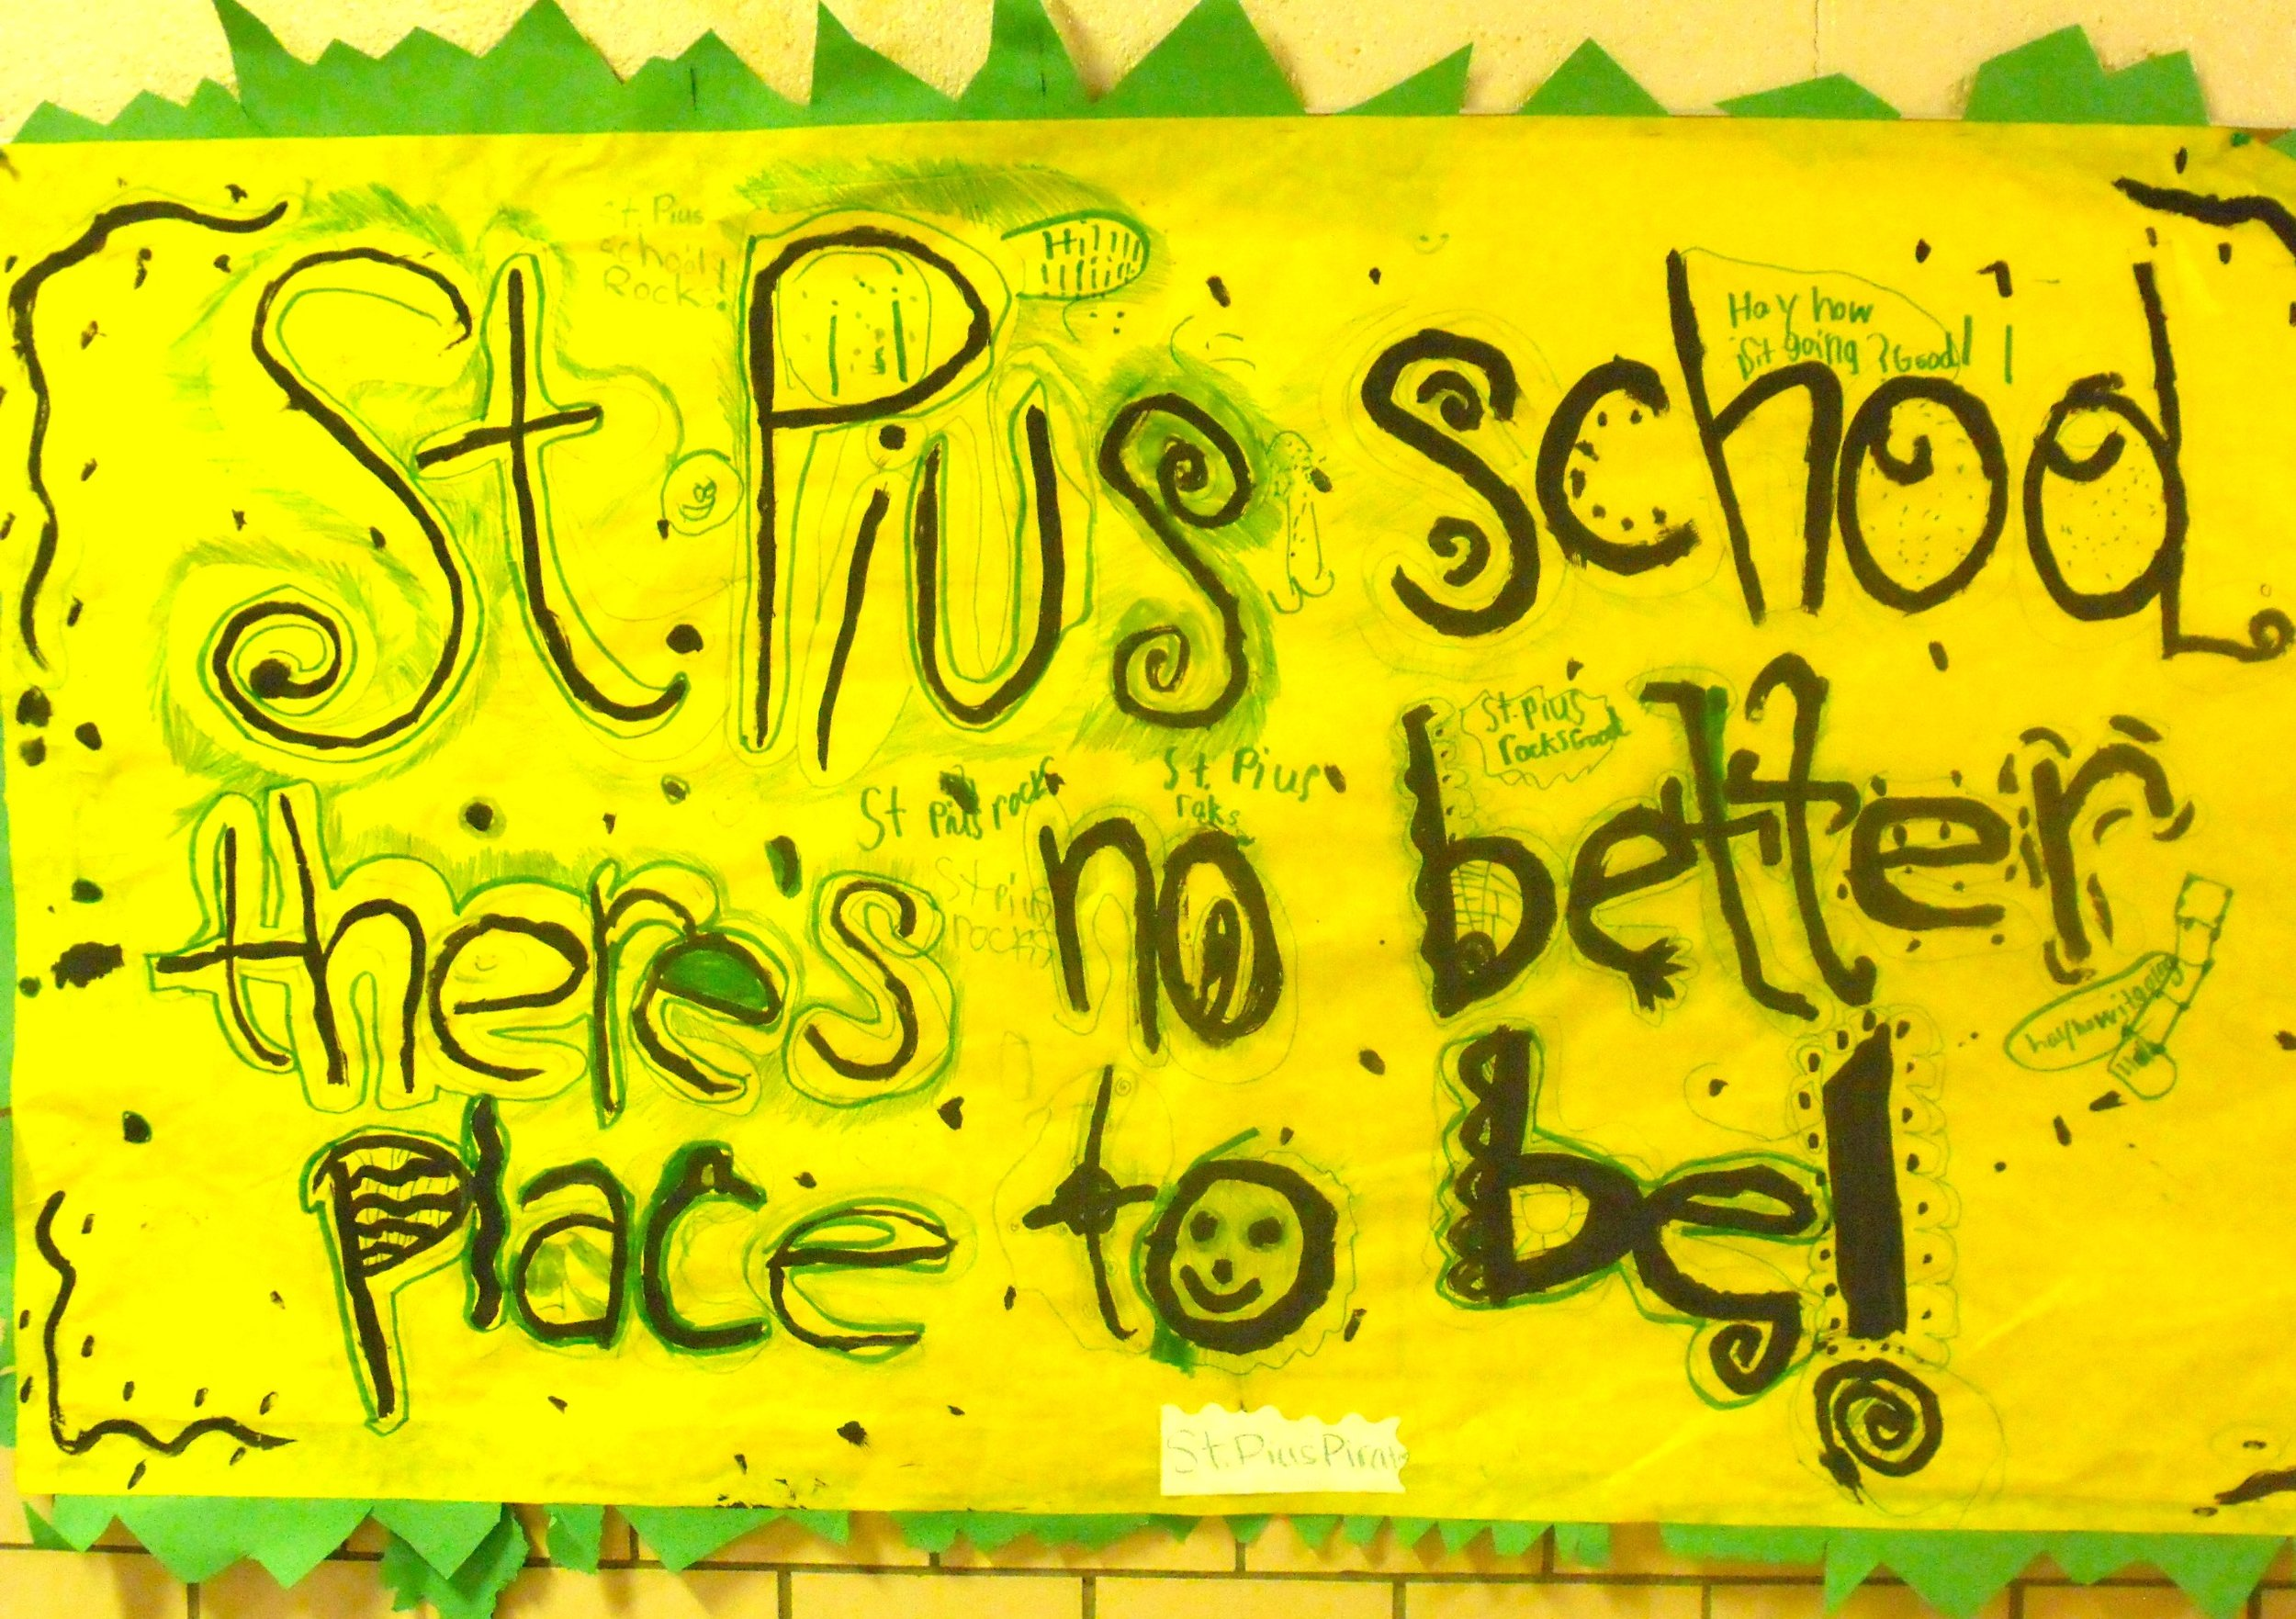 Written School Sign.jpg